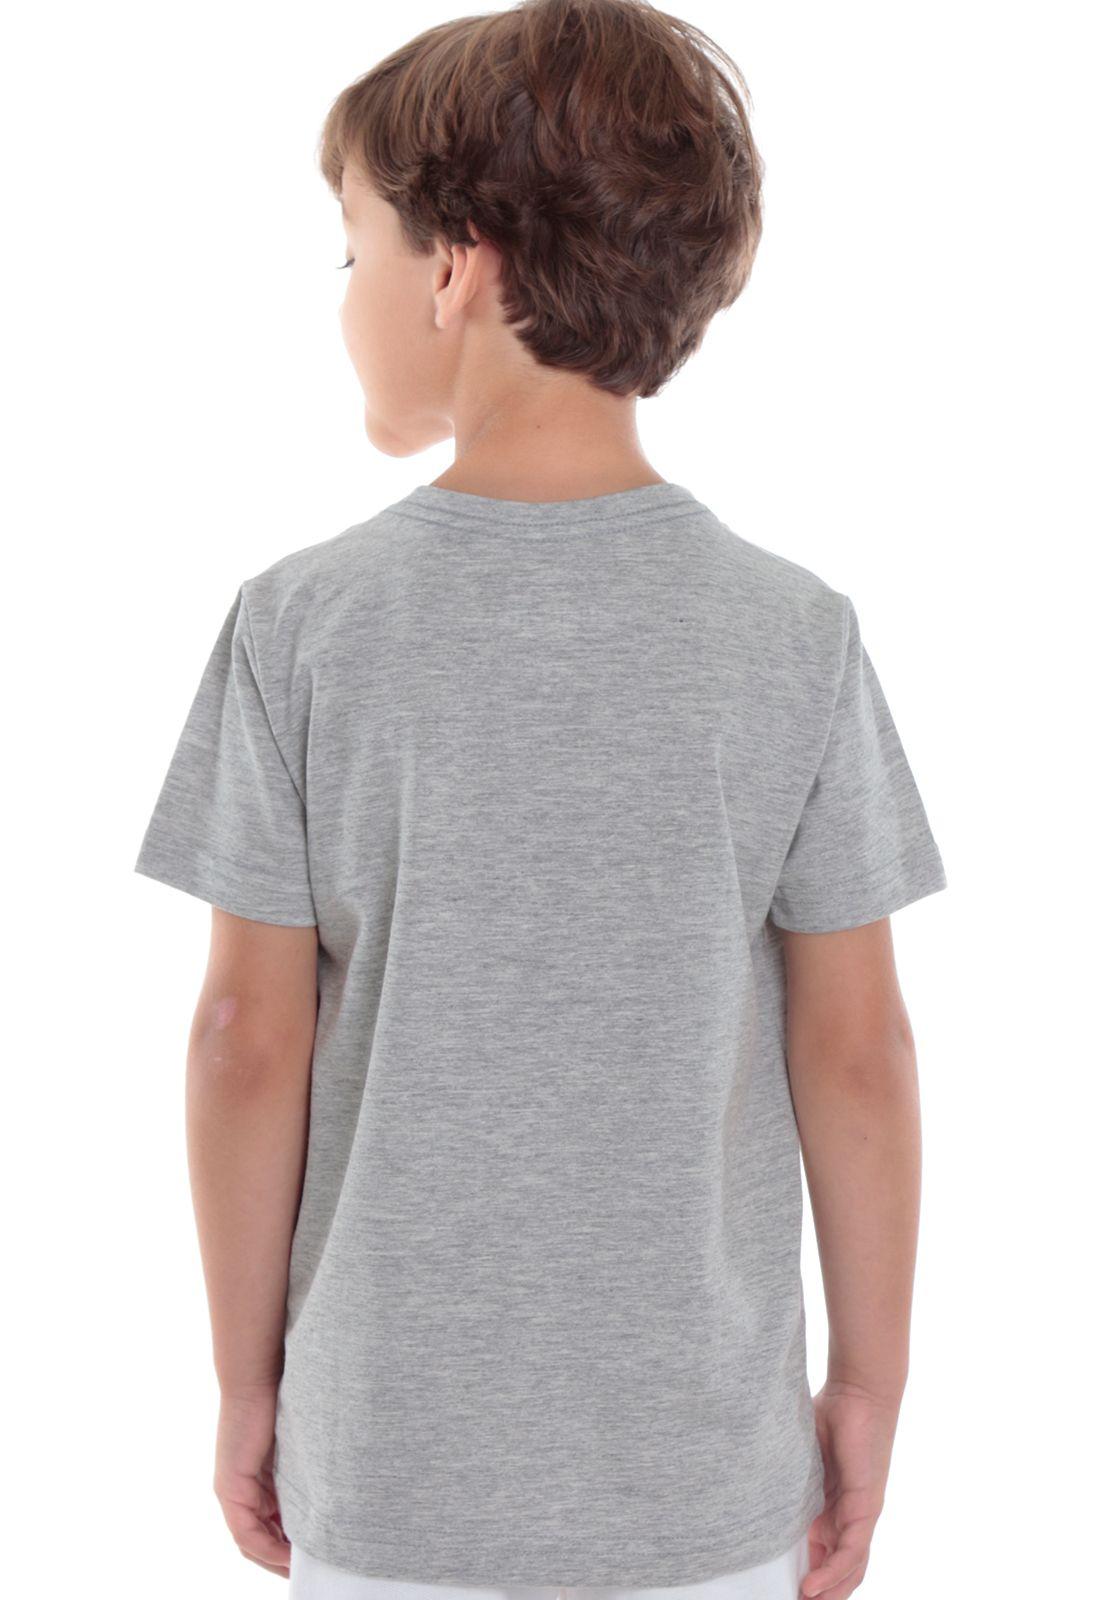 Camiseta Cinza Mescla